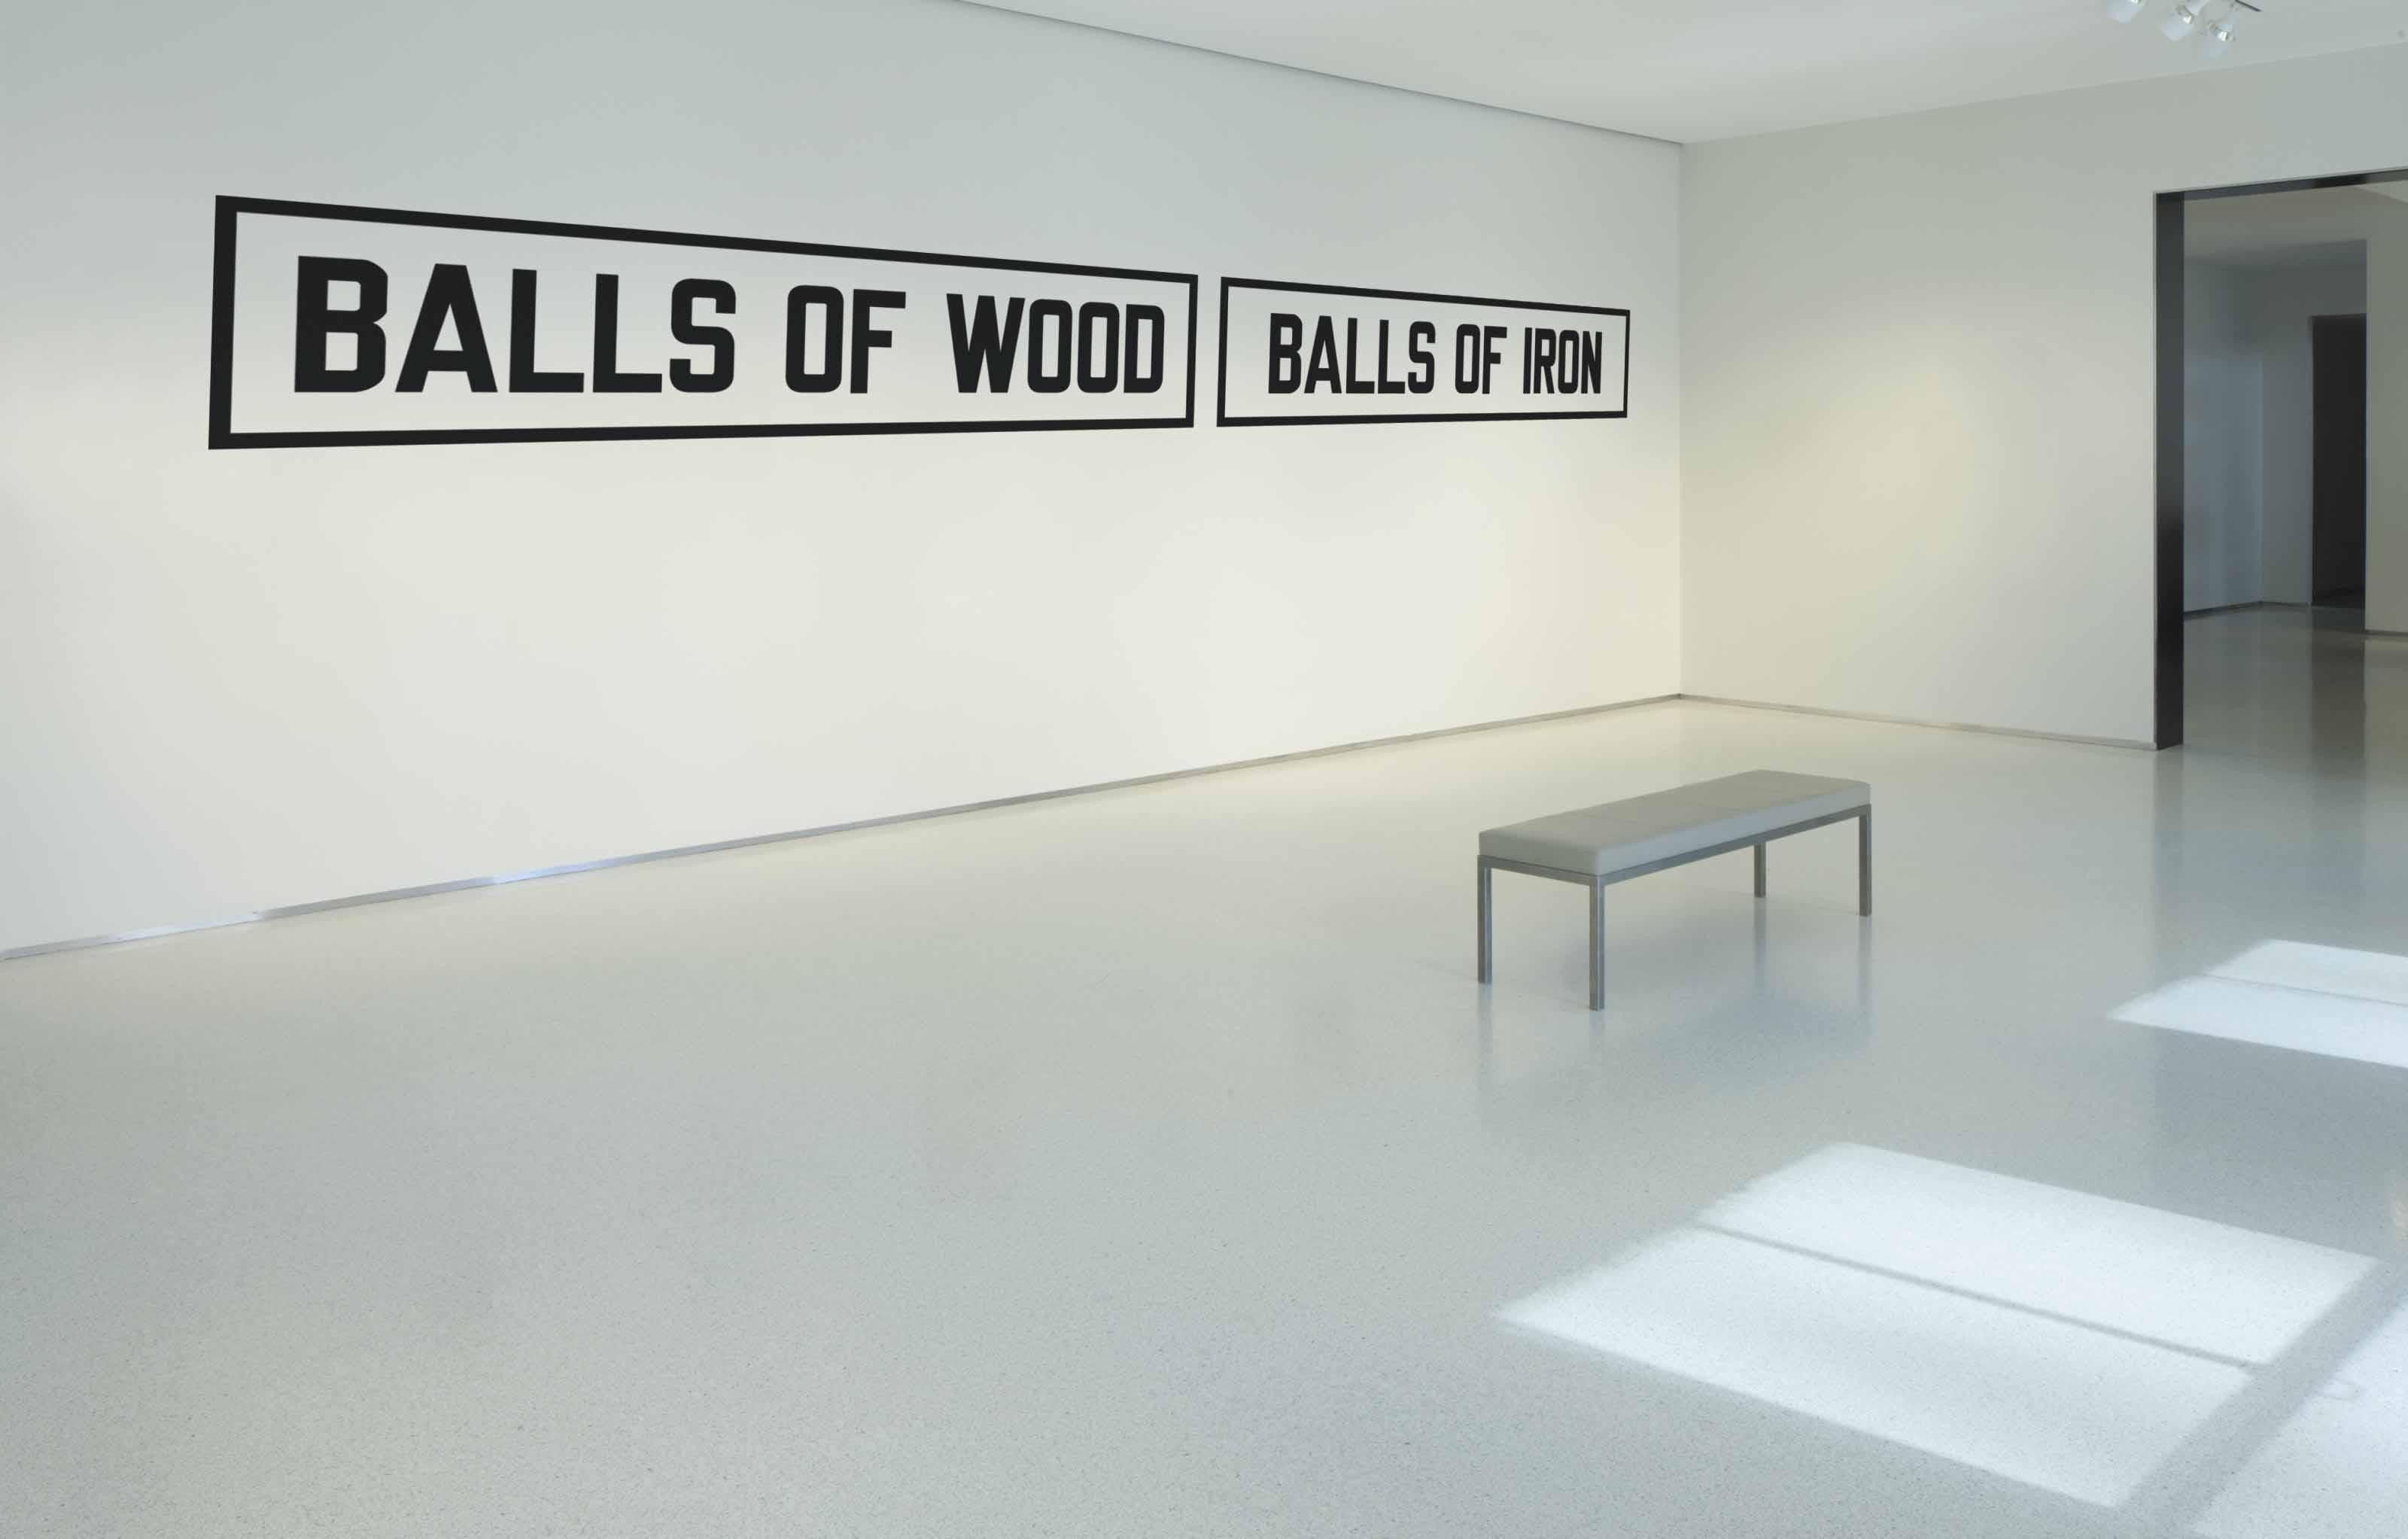 BALLS OF WOOD BALLS OF IRON